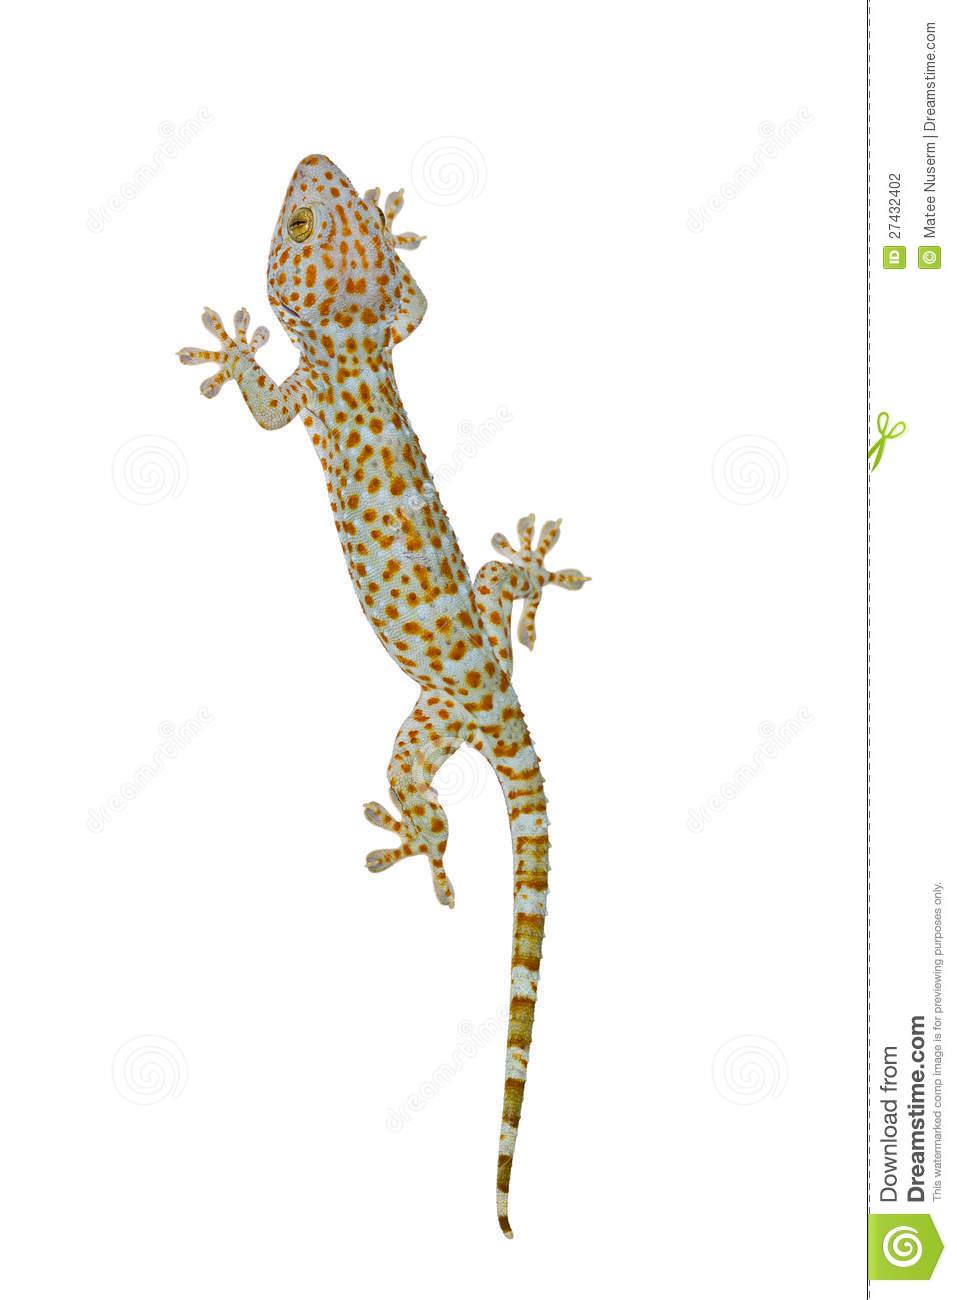 Tokay Gecko clipart #14, Download drawings